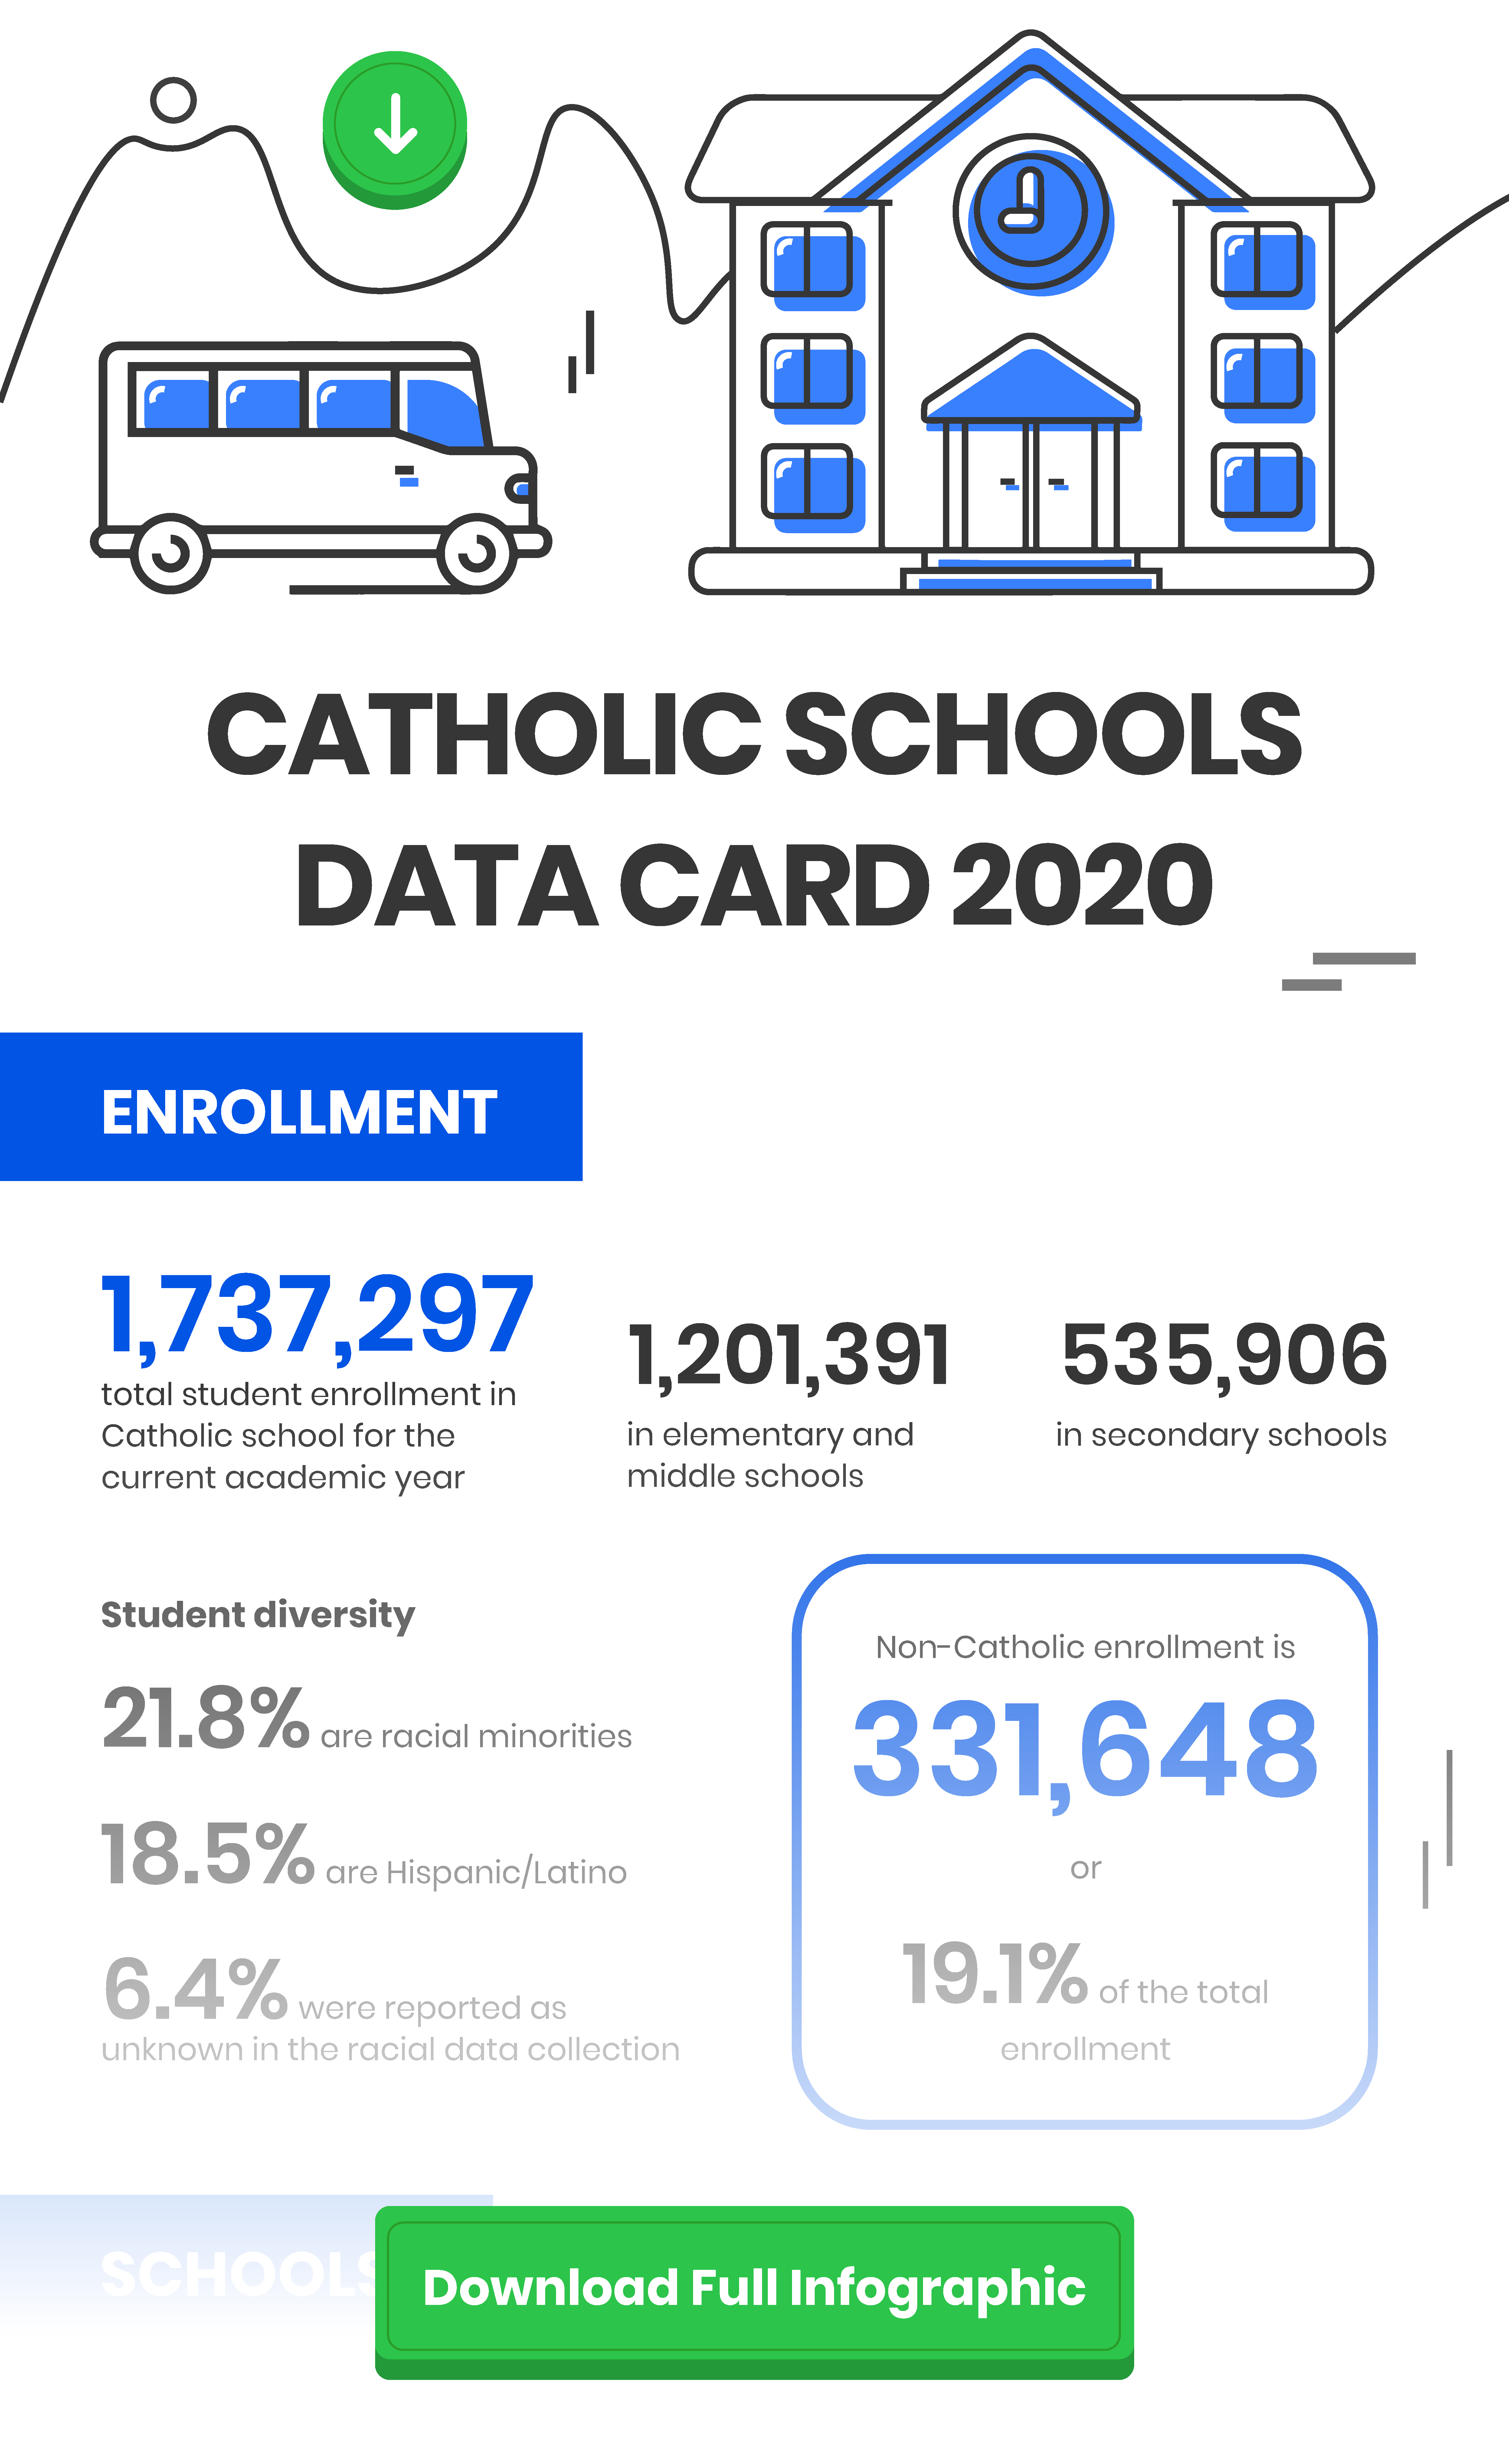 Top Image - Catholic Schools Data Card 2020